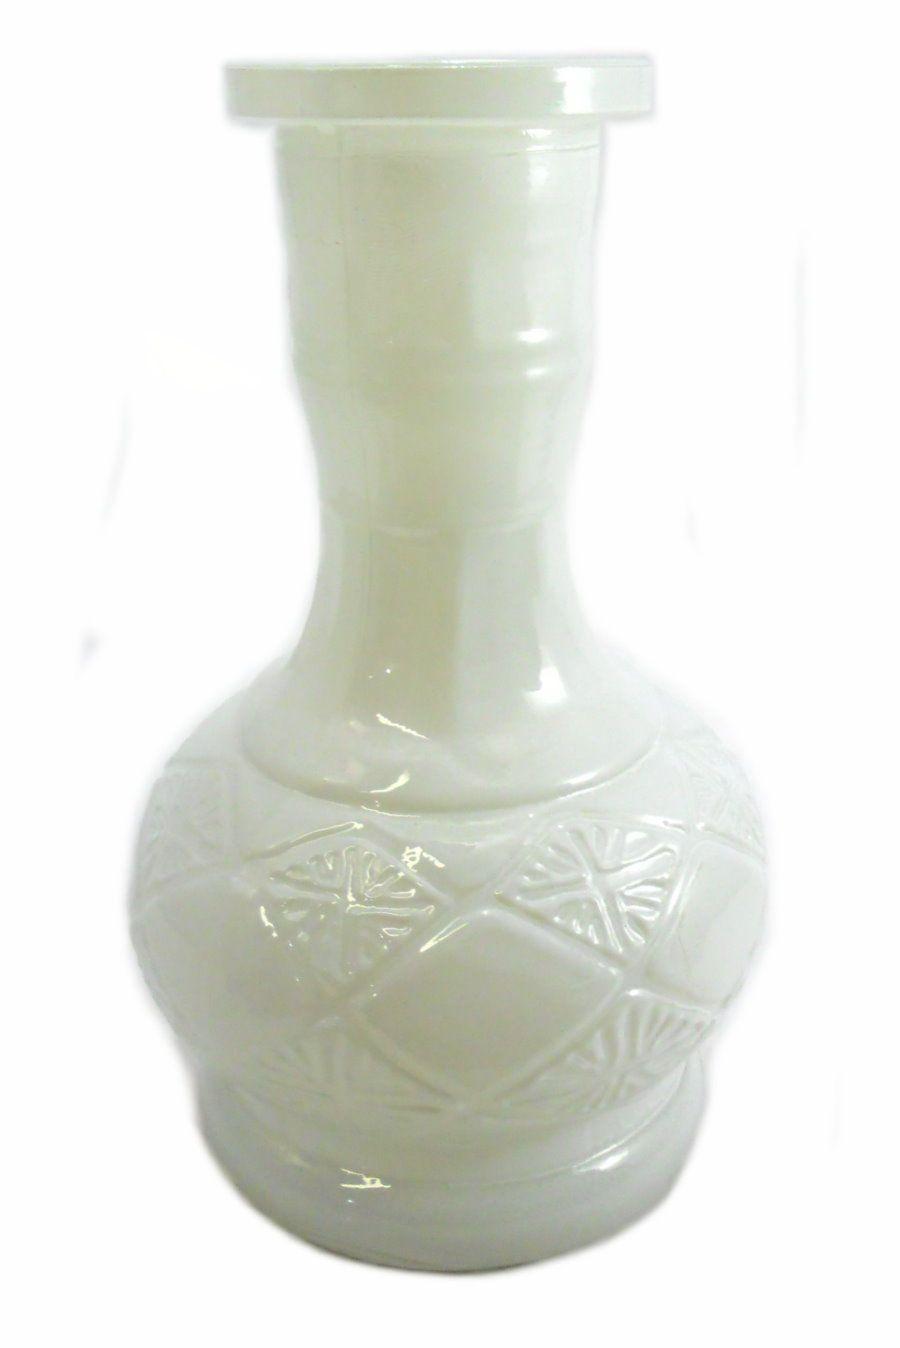 Vaso/base para narguile. 20cm altura e 3,7cm diâmetro do encaixe. Preto, branco ou azul.